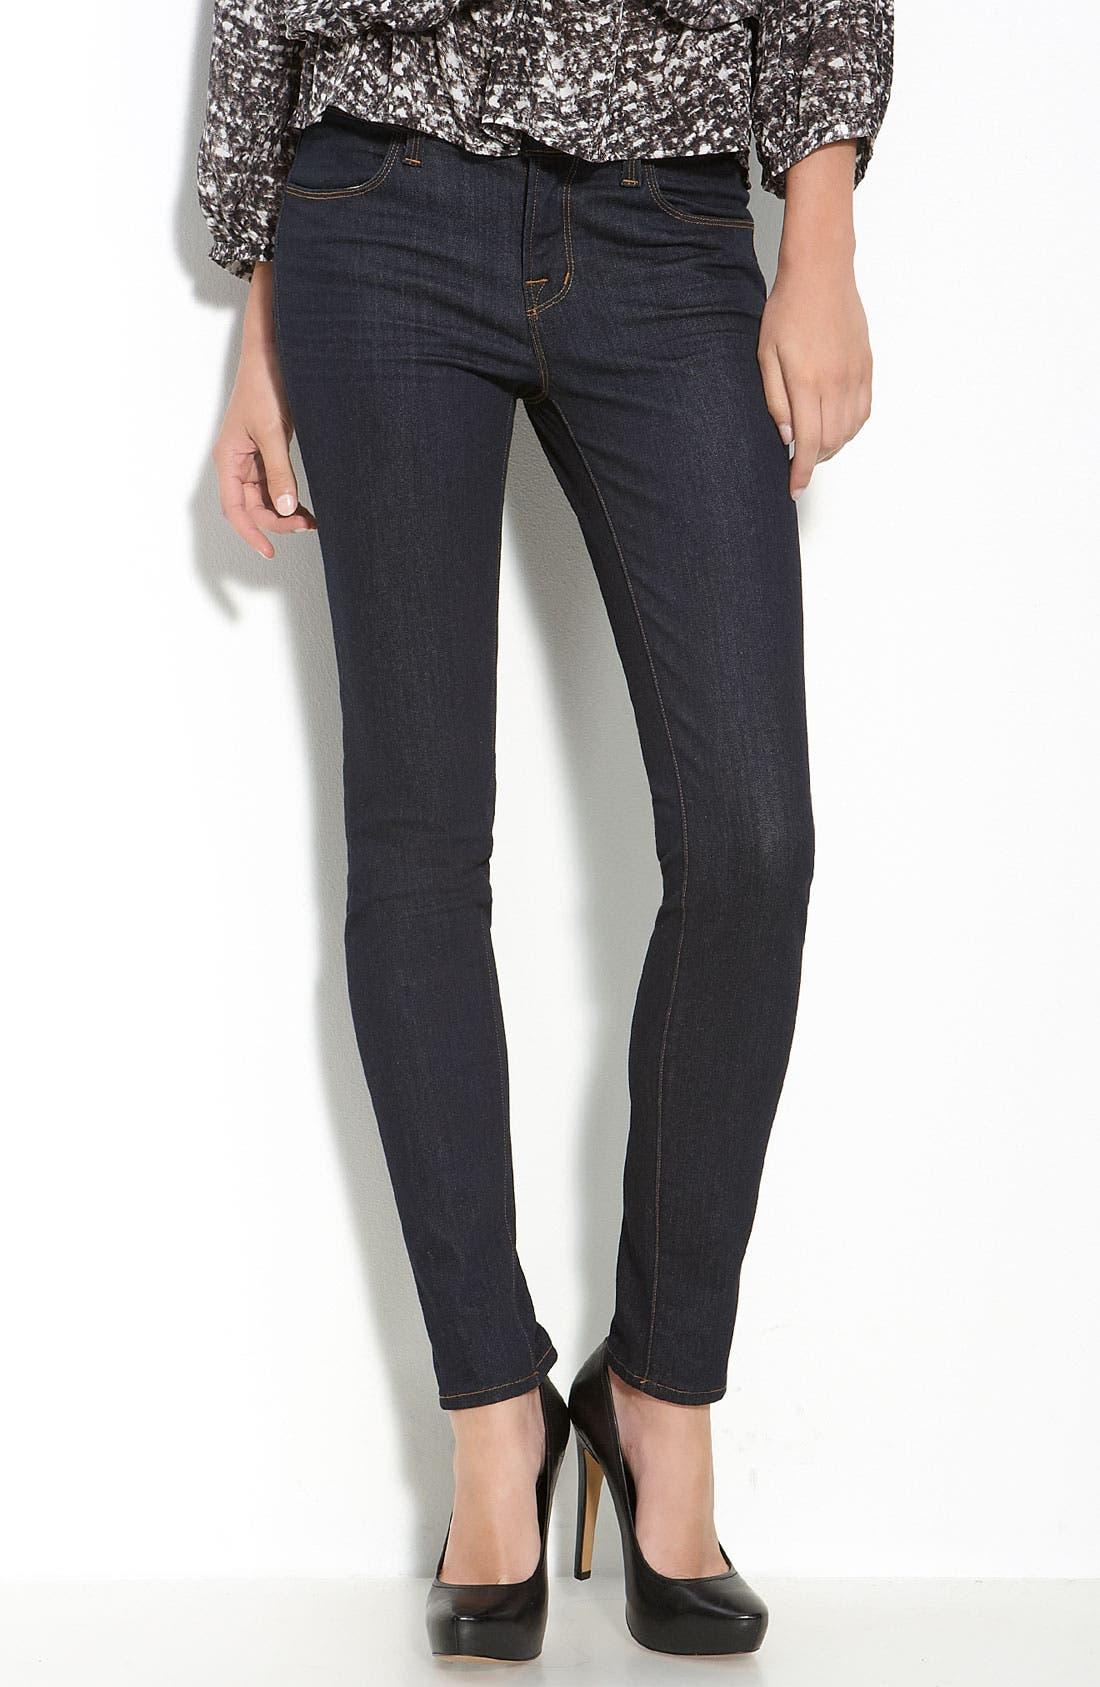 Alternate Image 1 Selected - J Brand Skinny Stretch Jeans (Starless Wash)